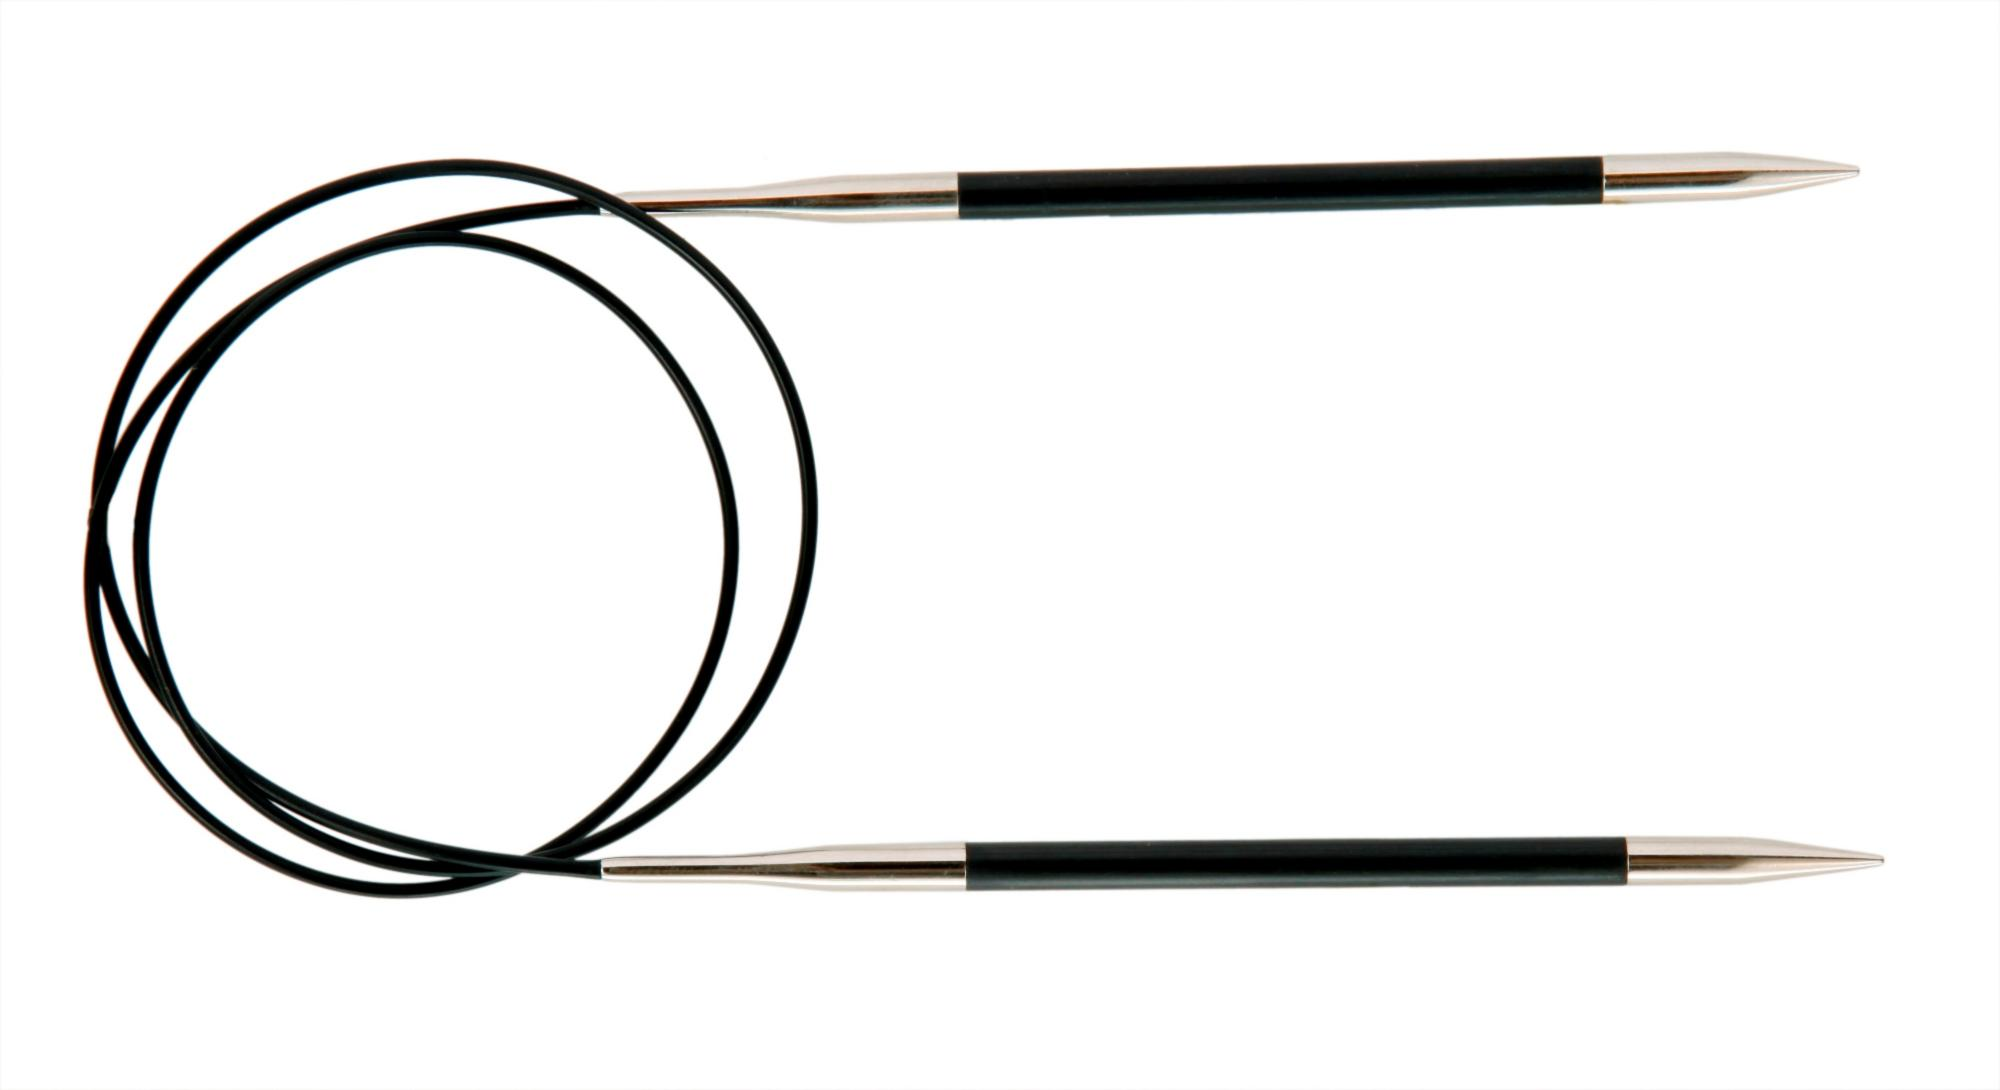 Спицы круговые 80 см Karbonz KnitPro, 41180, 2.00 мм